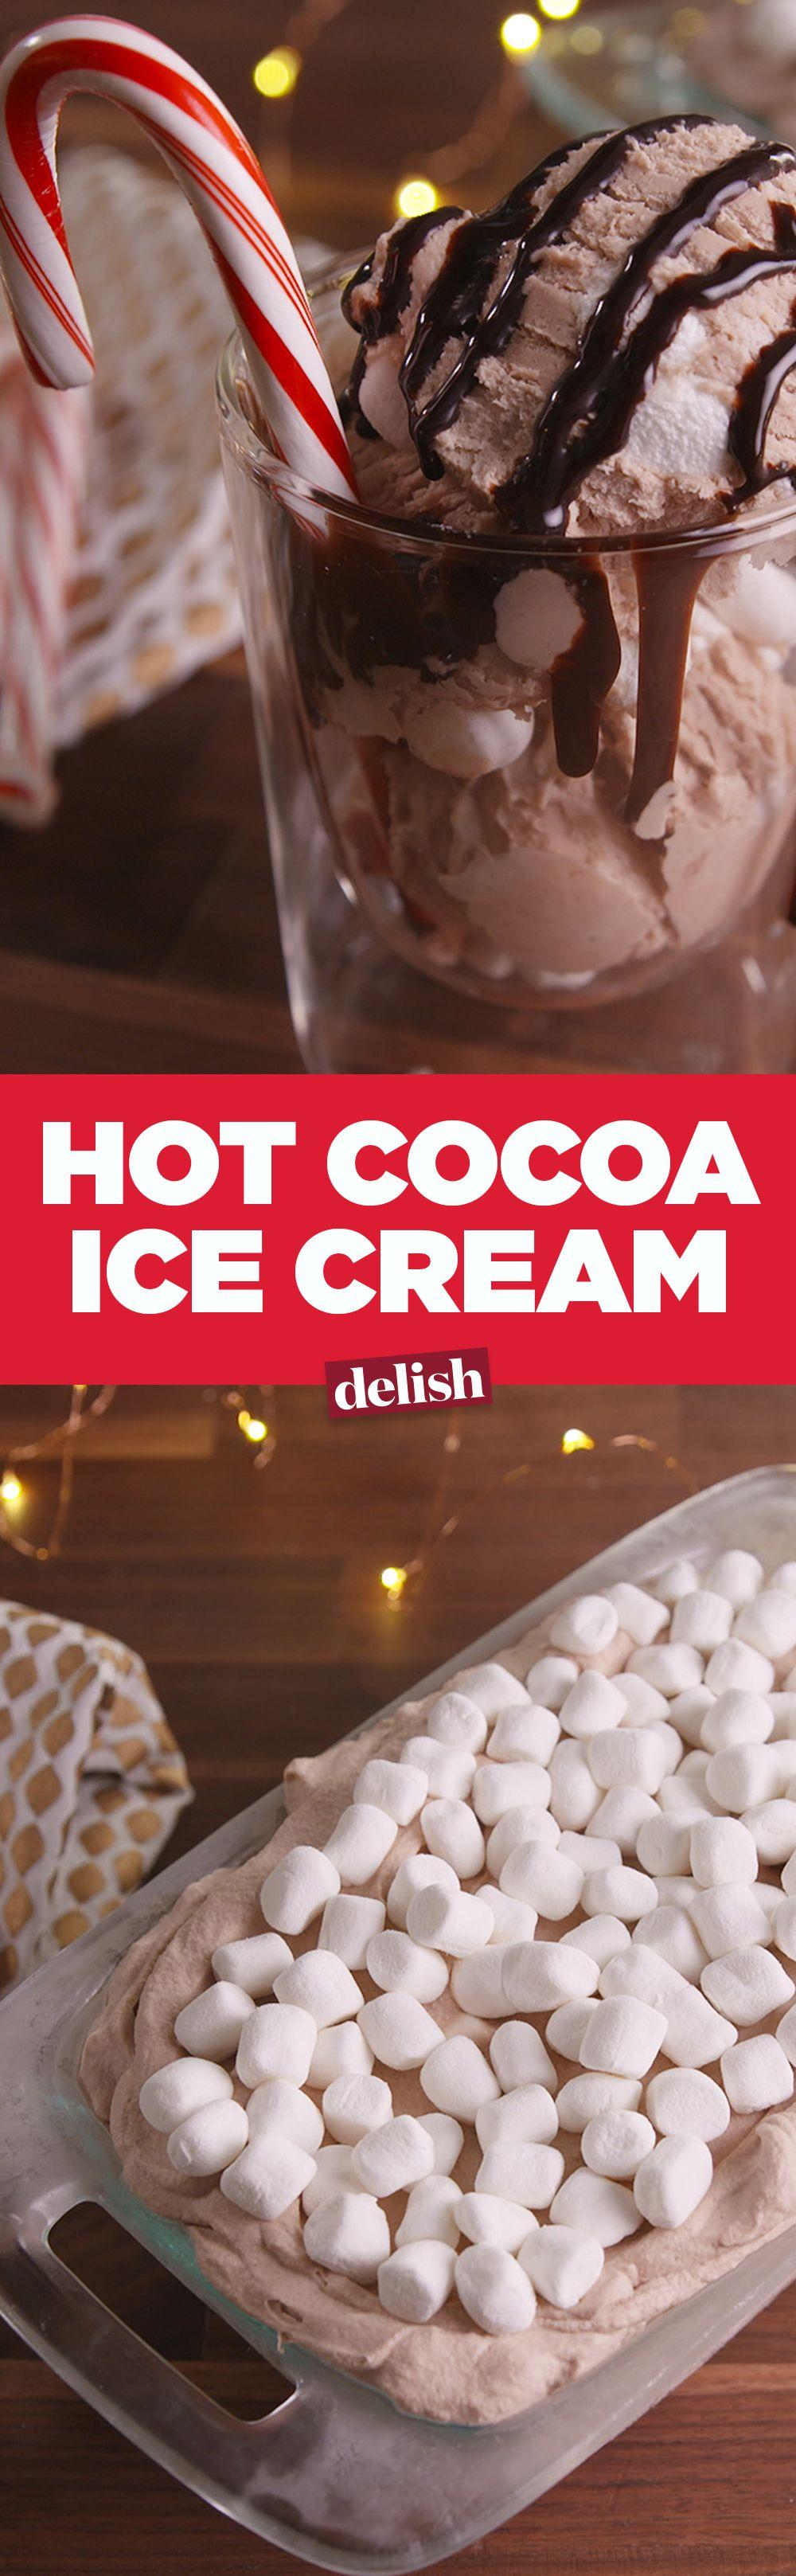 Hot Cocoa Ice Cream Recipe Ice Cream Recipes Homemade Ice Cream Desserts